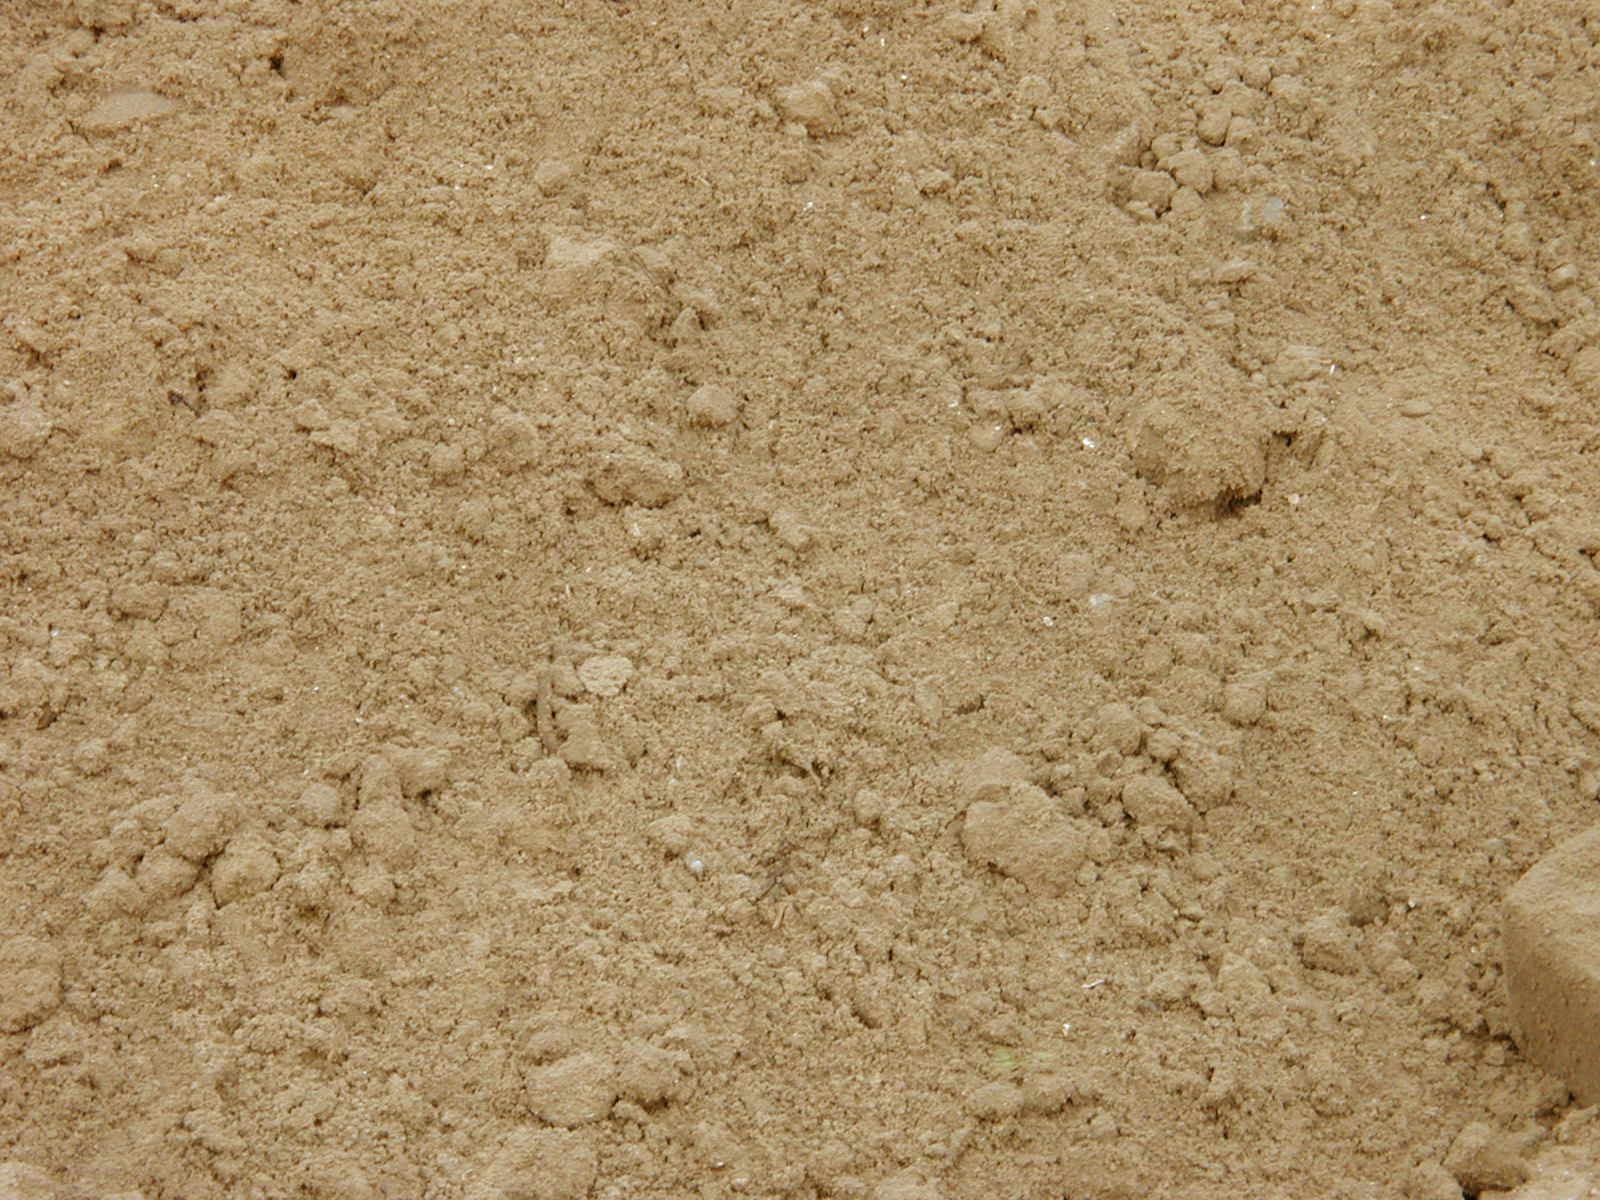 dirt5.jpg